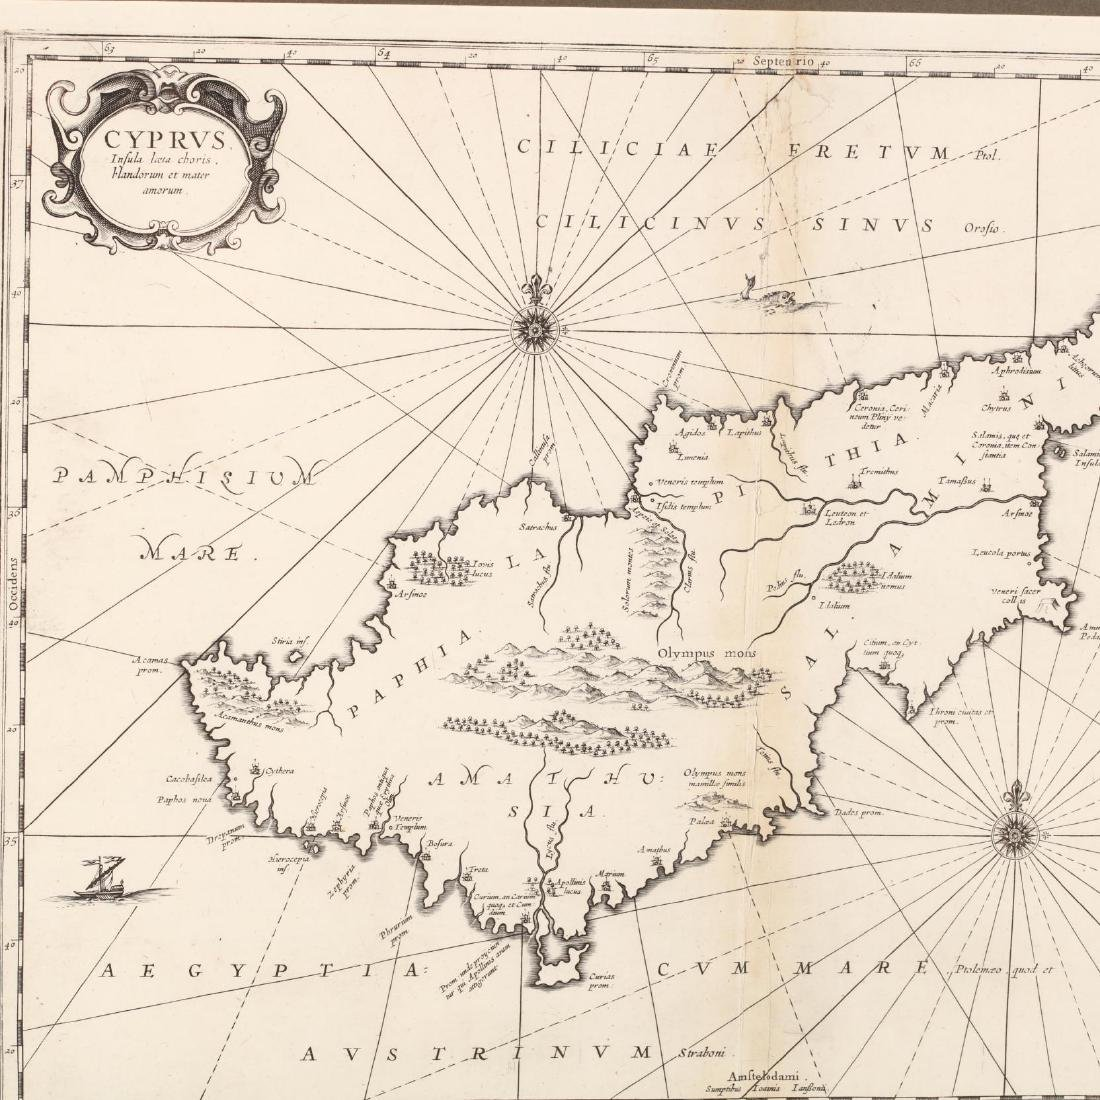 Jansson, Jan.  Cyprus. Insula laeta choris, blandorum - 2